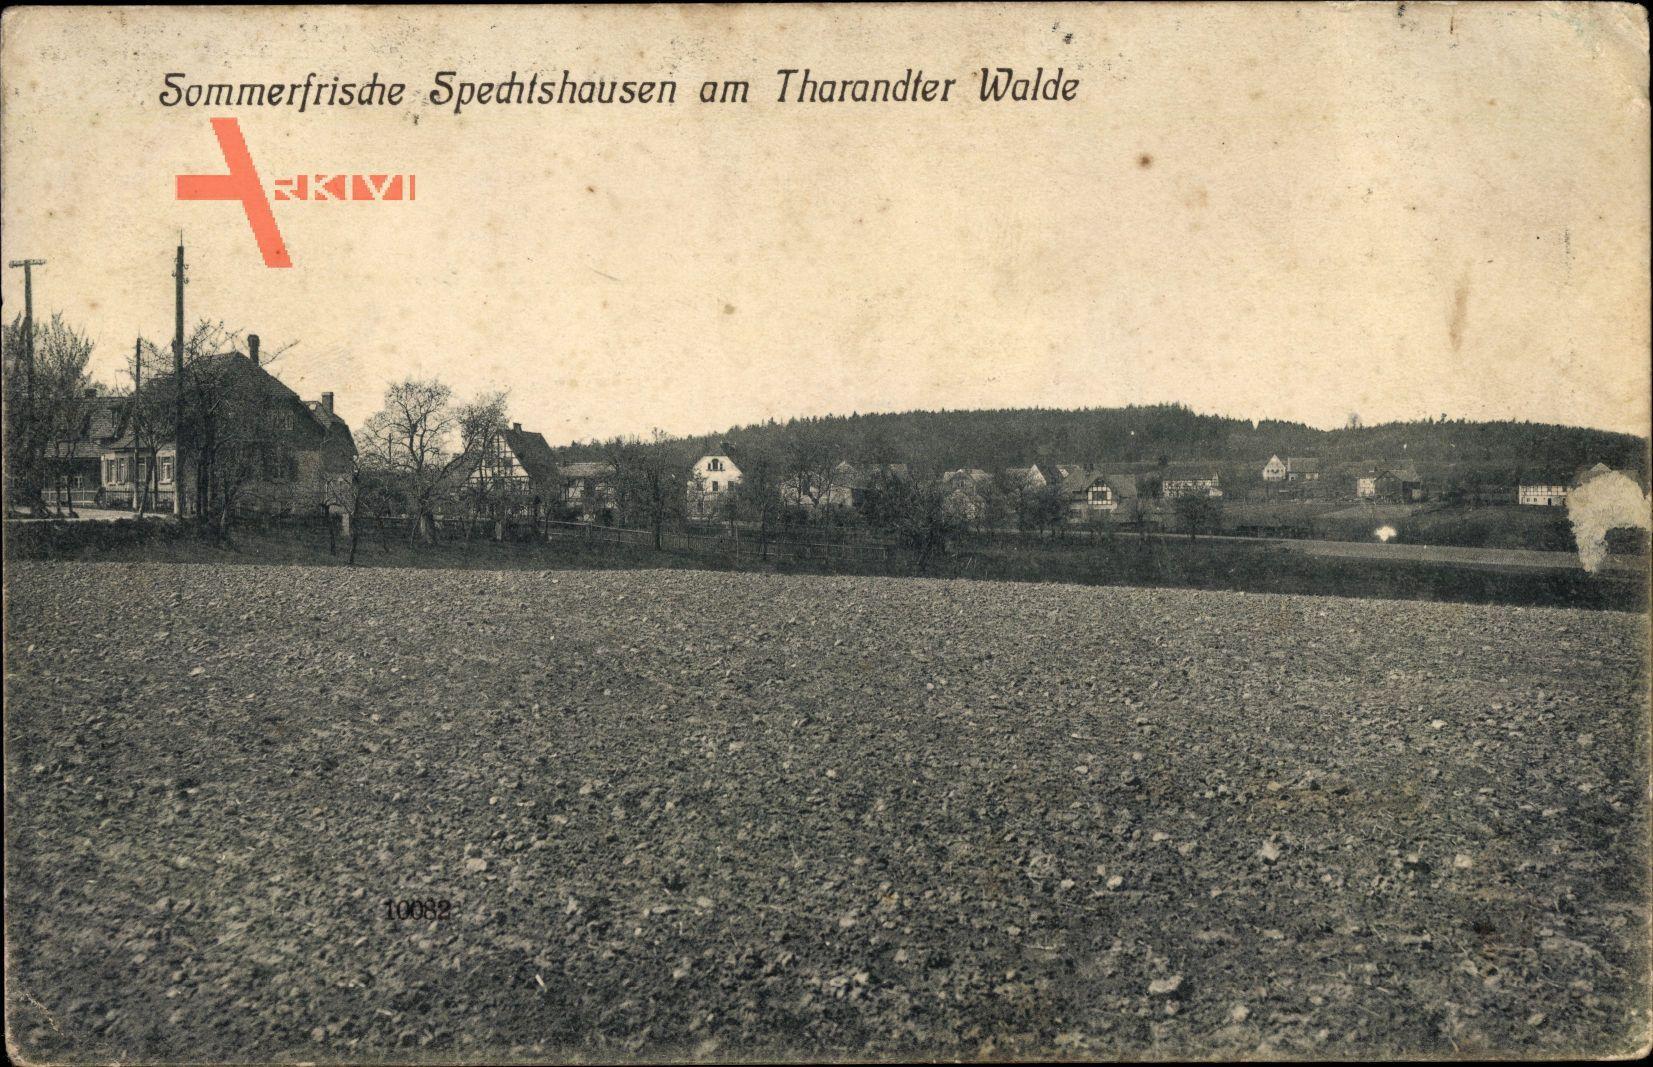 Spechtshausen Tharandt im Erzgebirge, Stadtpanorama, Feld, Masten